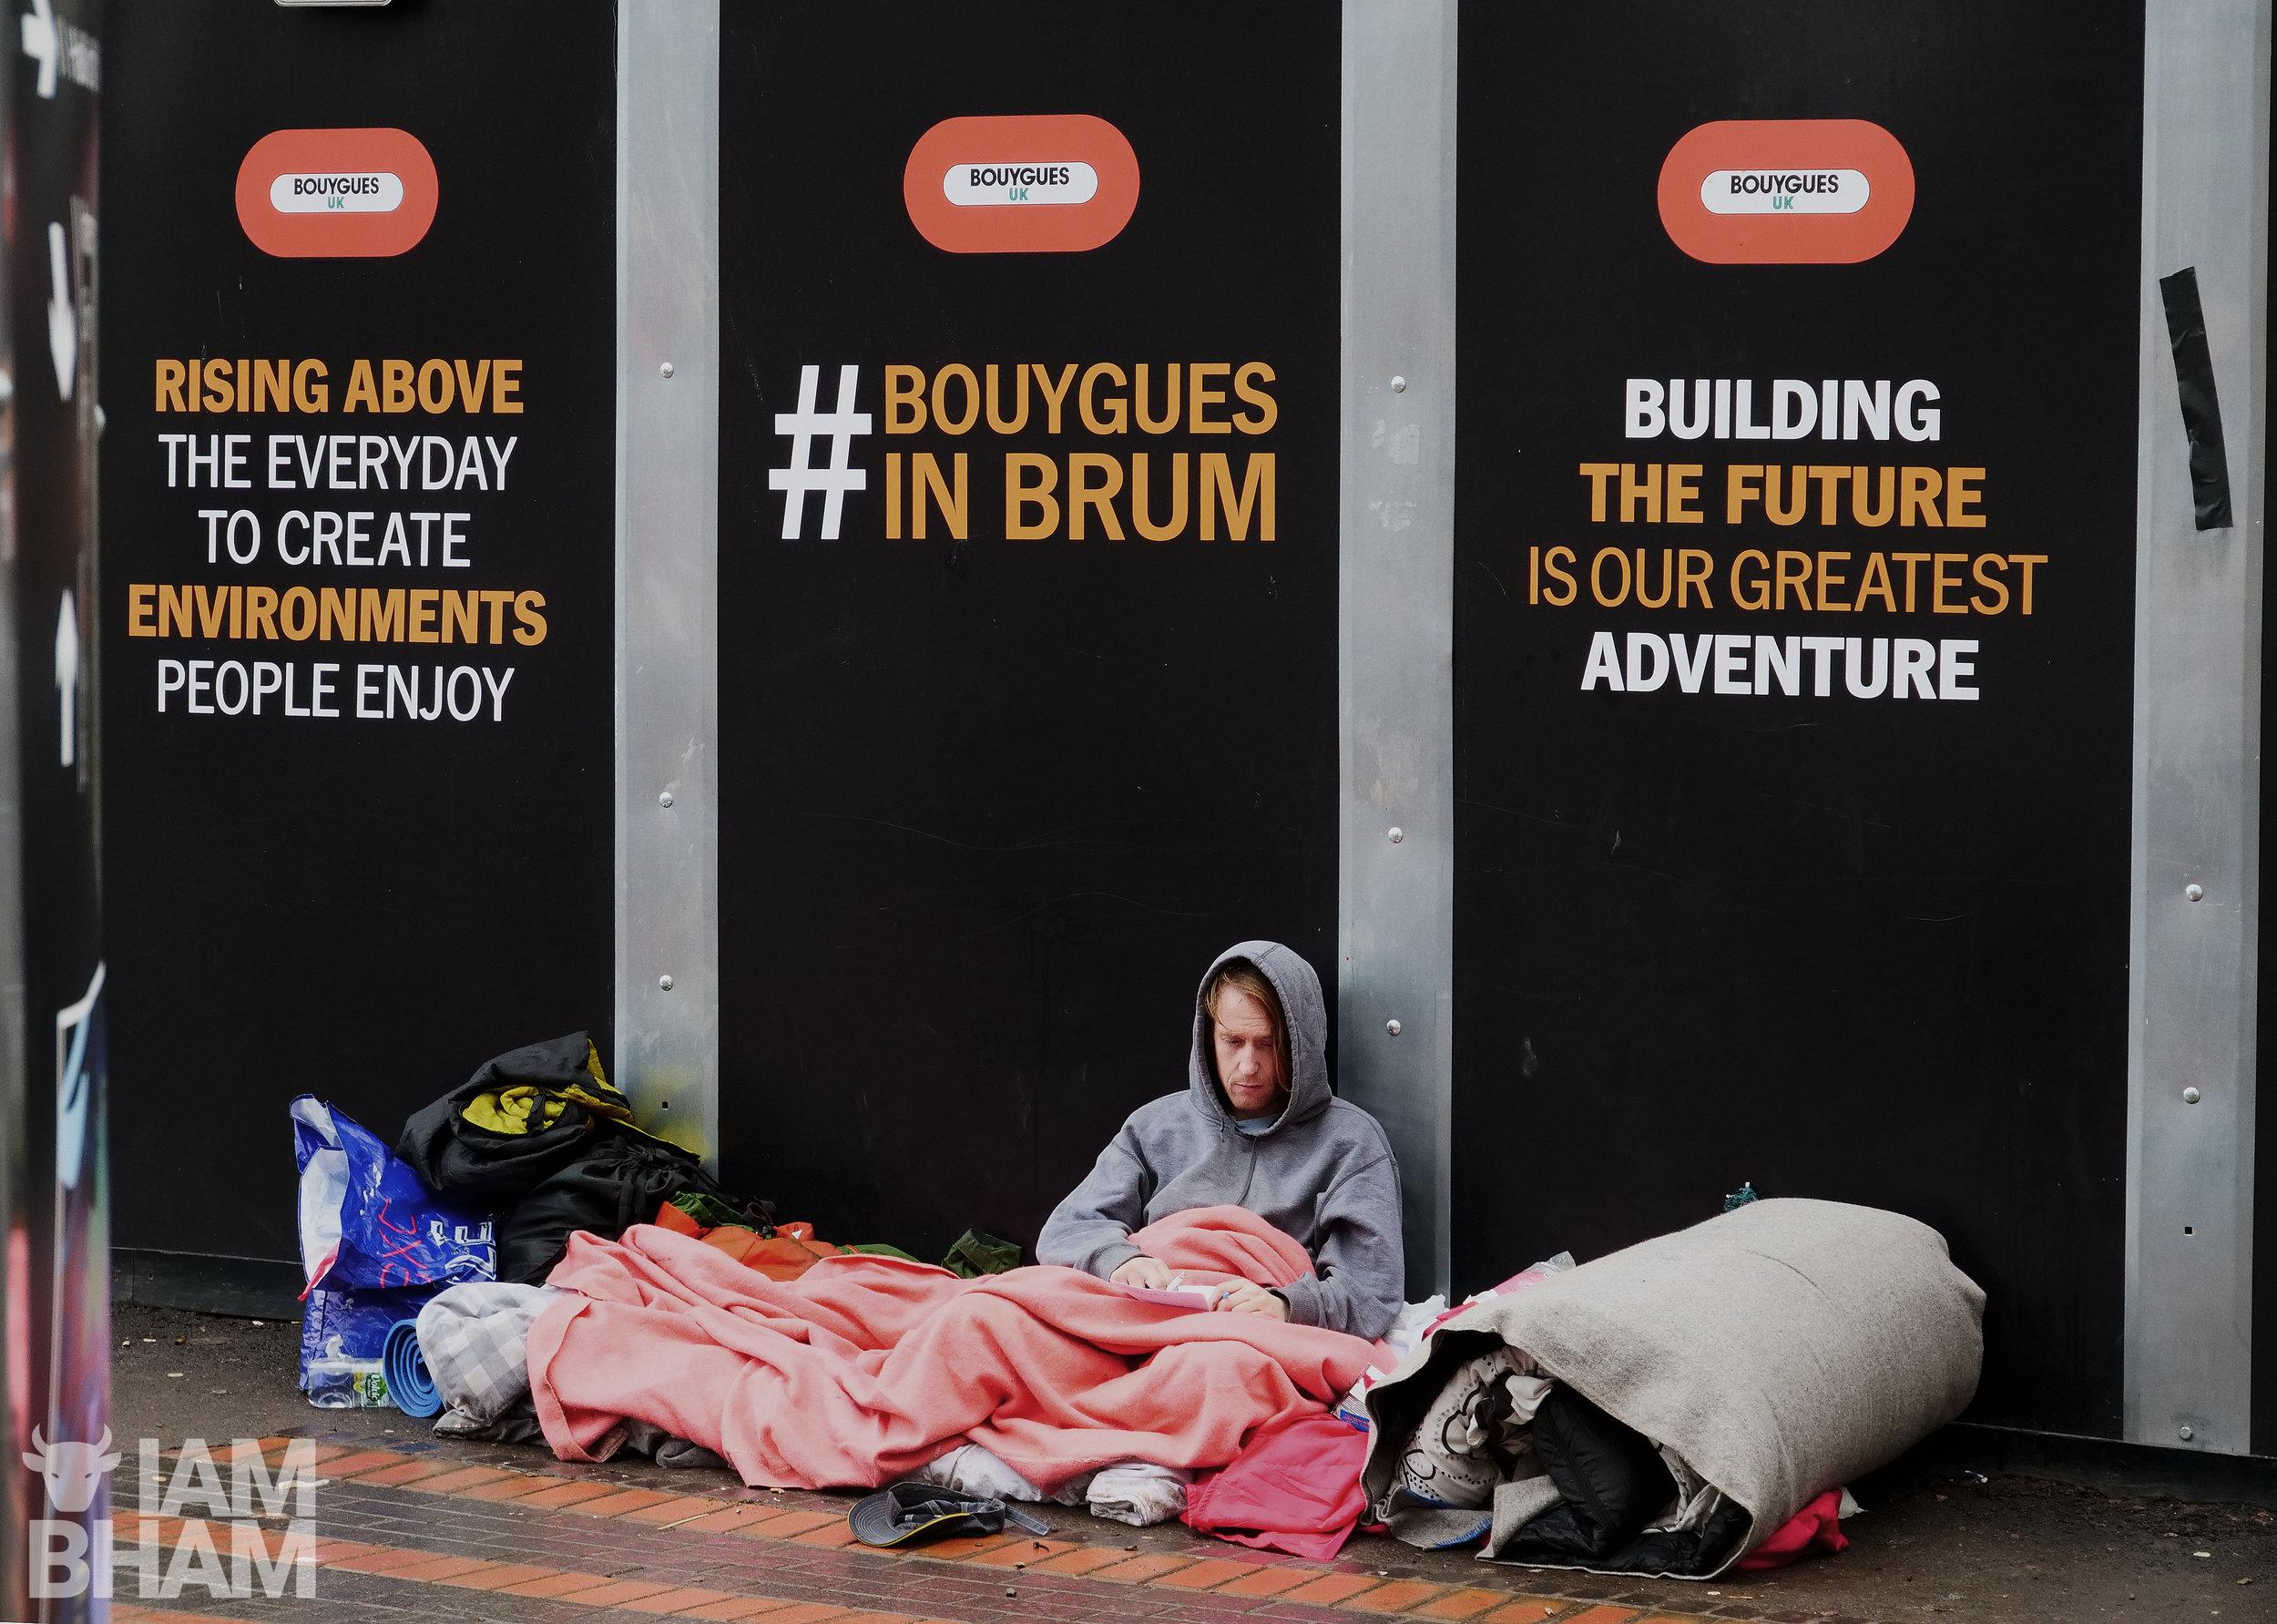 Photograph Credit: I am Birmingham (Adam Yosef)